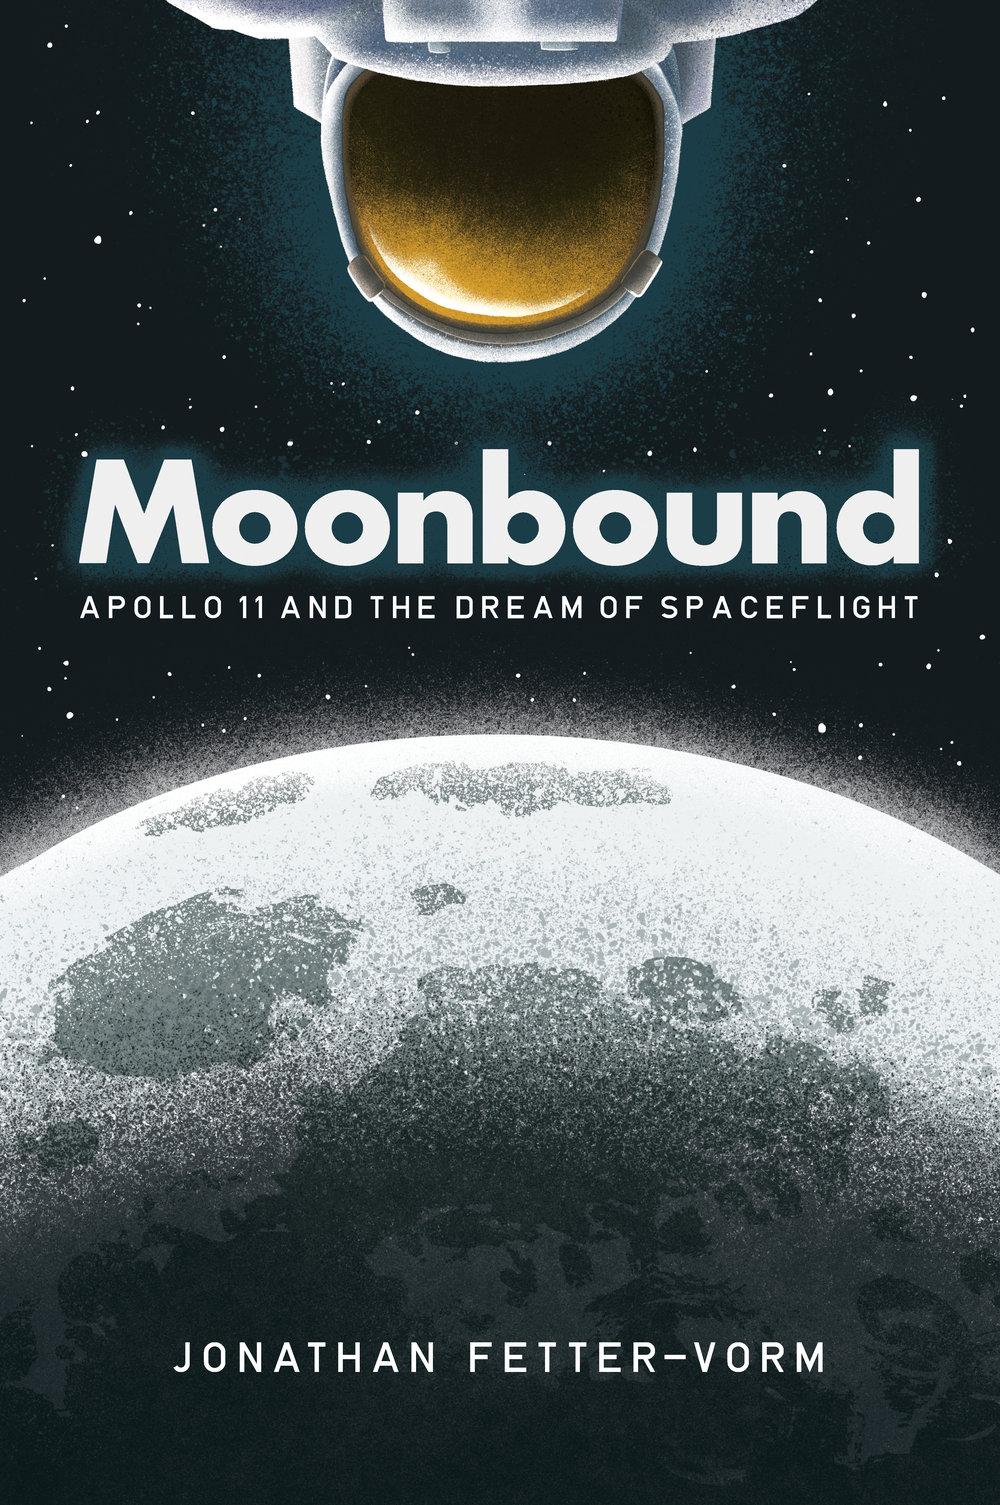 http://www.pastemagazine.com/articles/2019/06/26/MoonboundCover.jpg